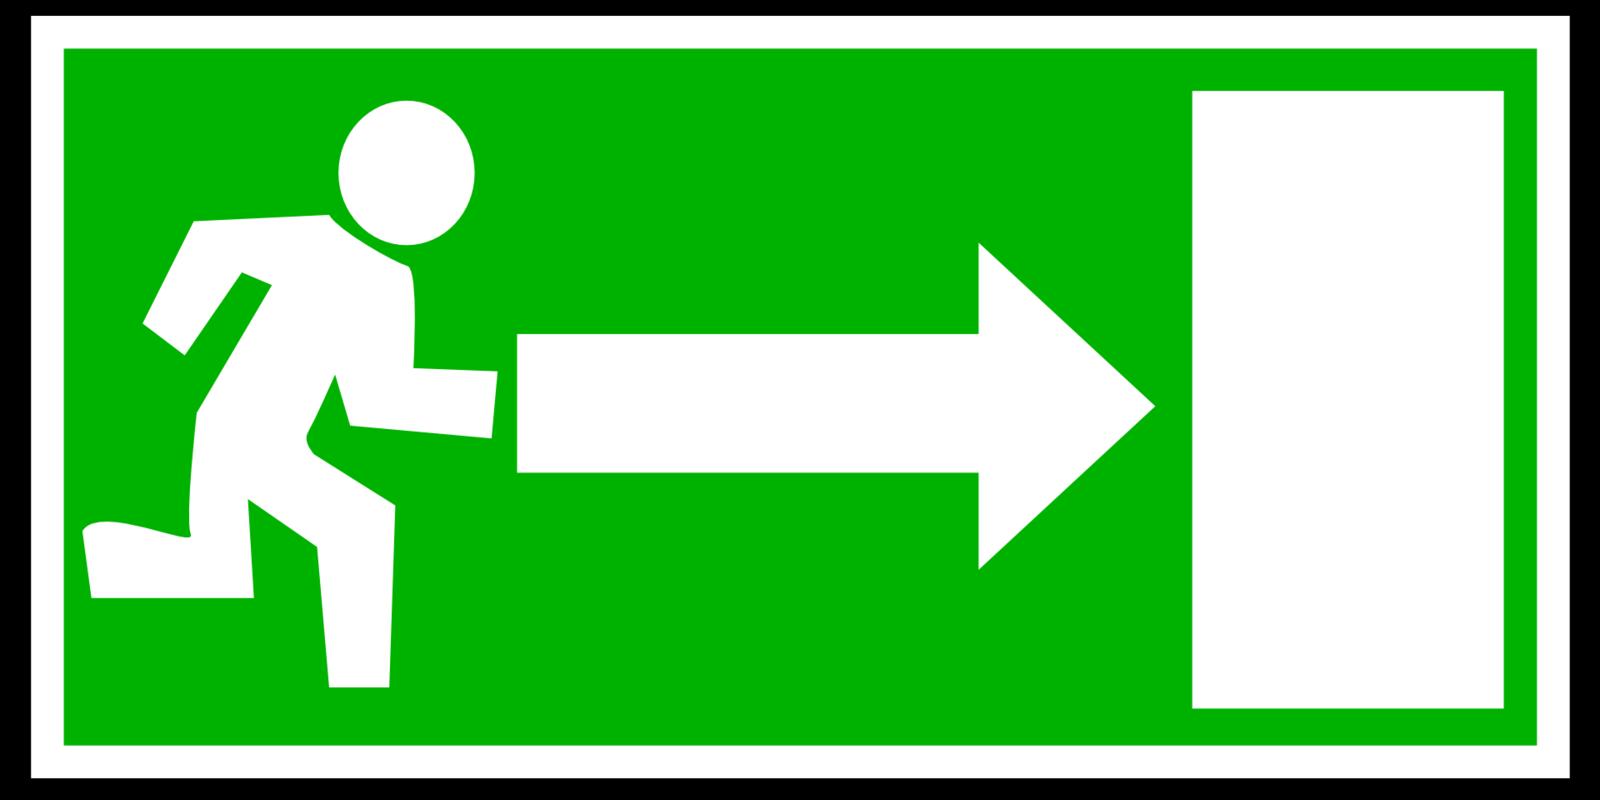 Nooduitgang pictogram